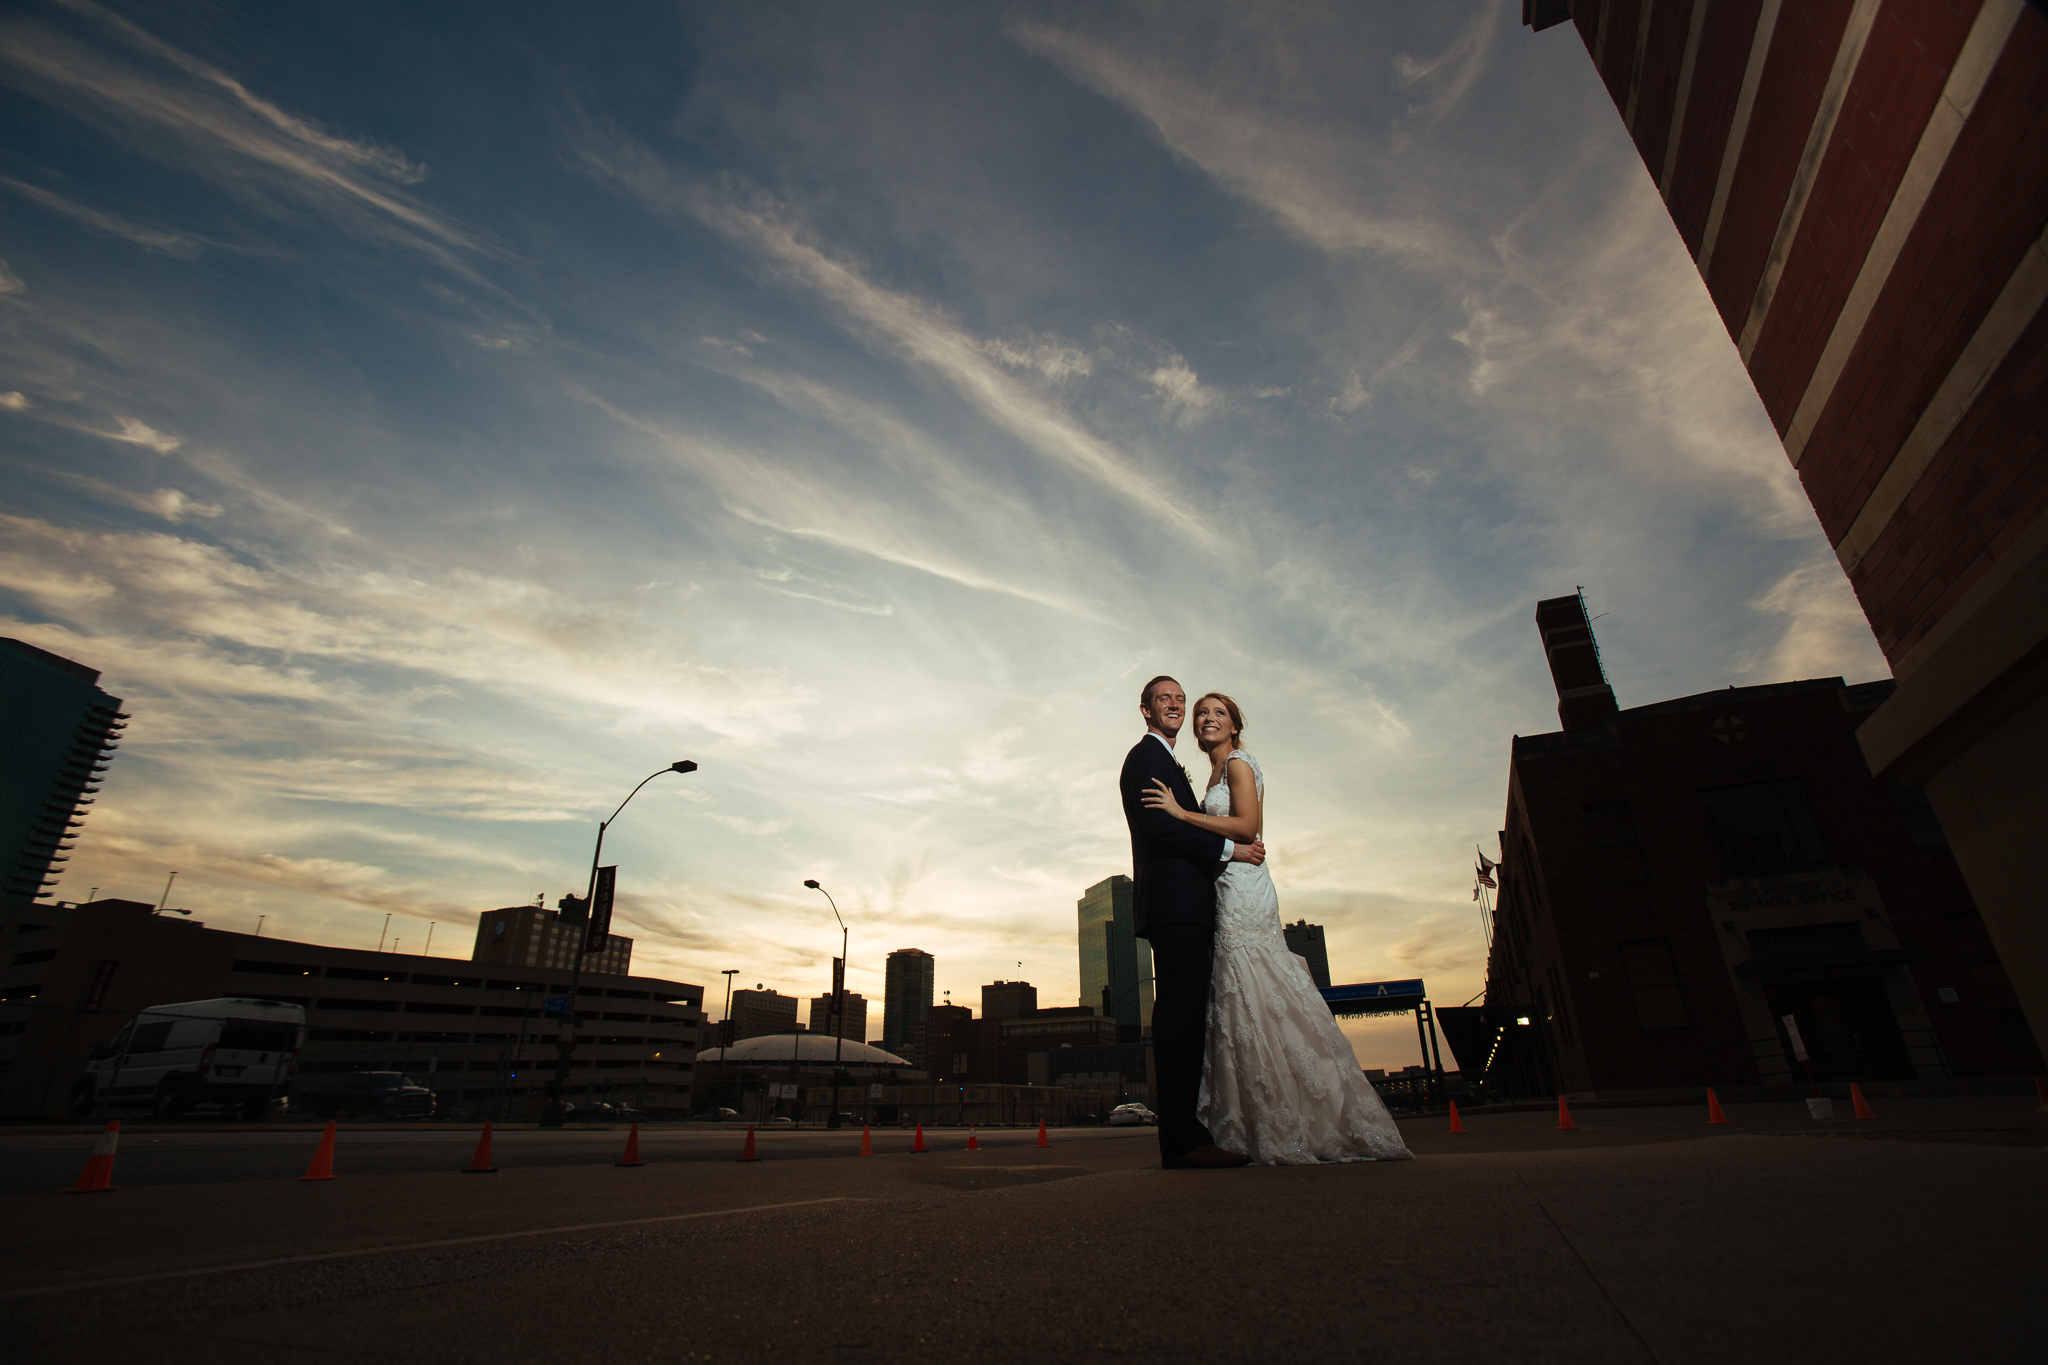 Michael and Kelly - the ashton depot - wedding DFW - wedding photographer- elizalde photography (98 of 150).jpg